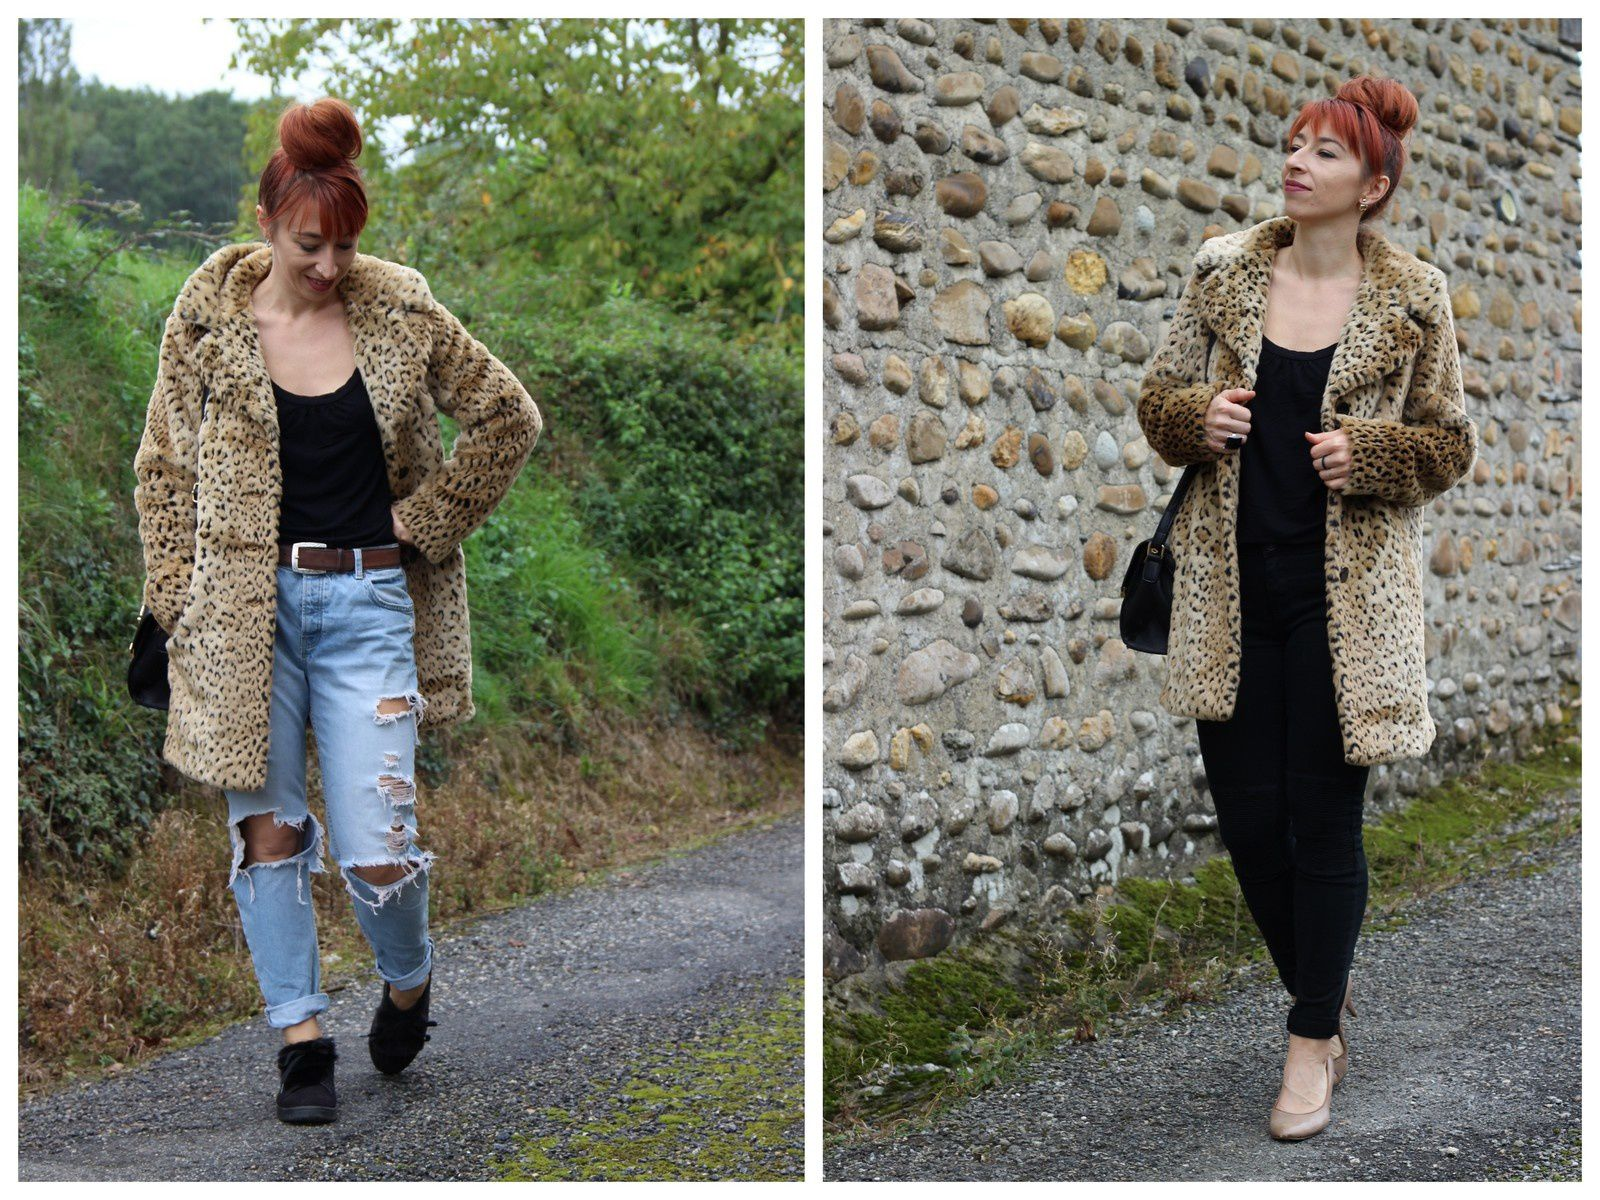 Manteau de fourrure léopard : 2 looks !